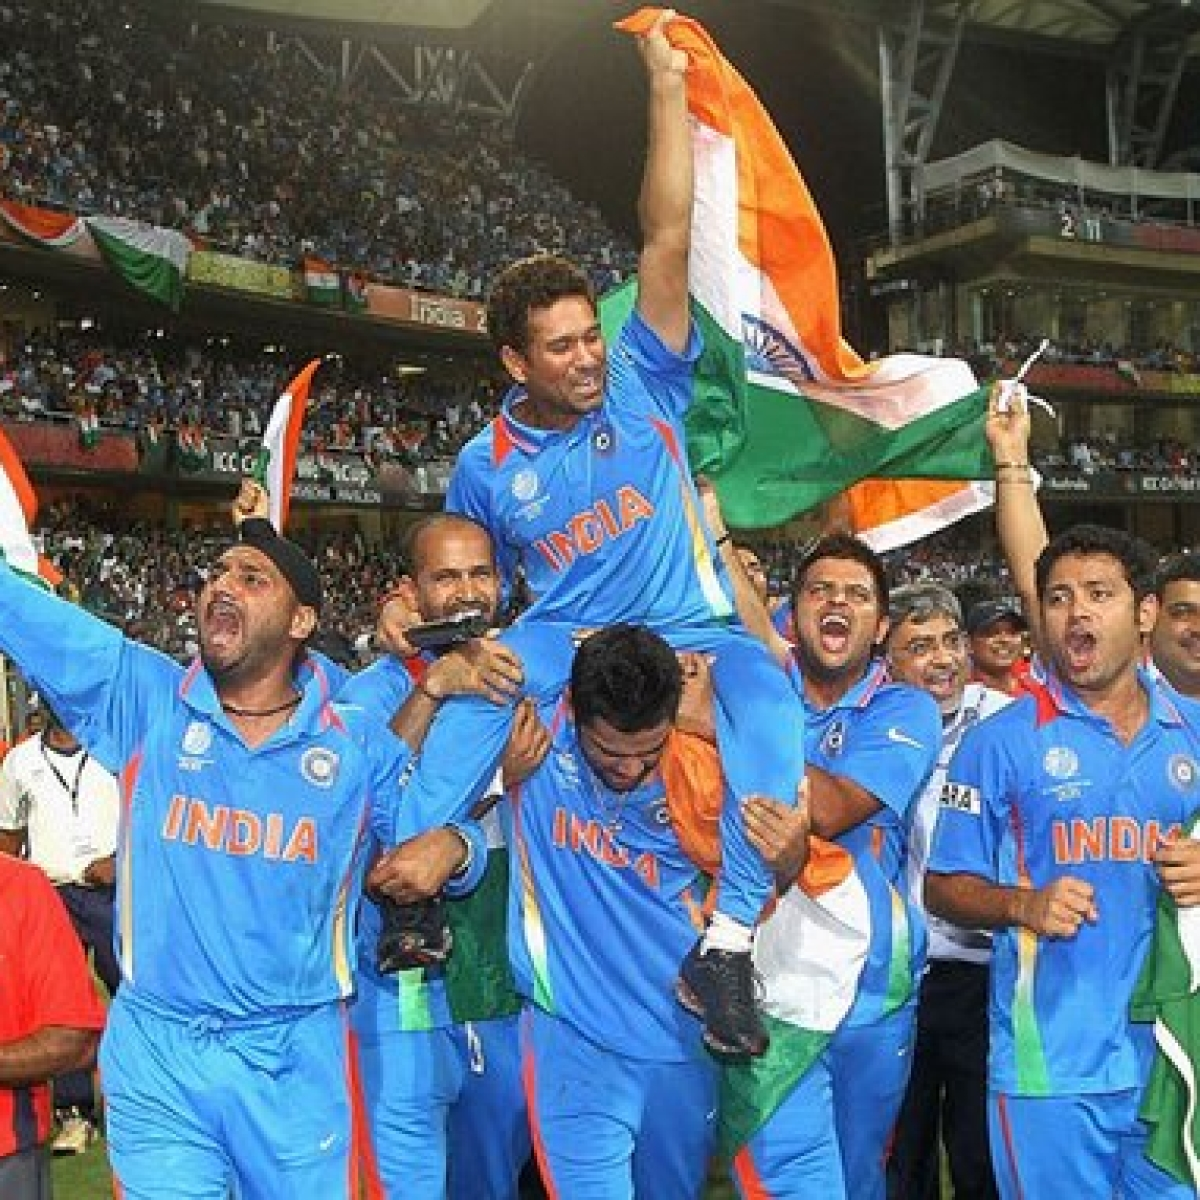 Sachin Tendulkar's 2011 WC win moment shortlisted for Laureus award